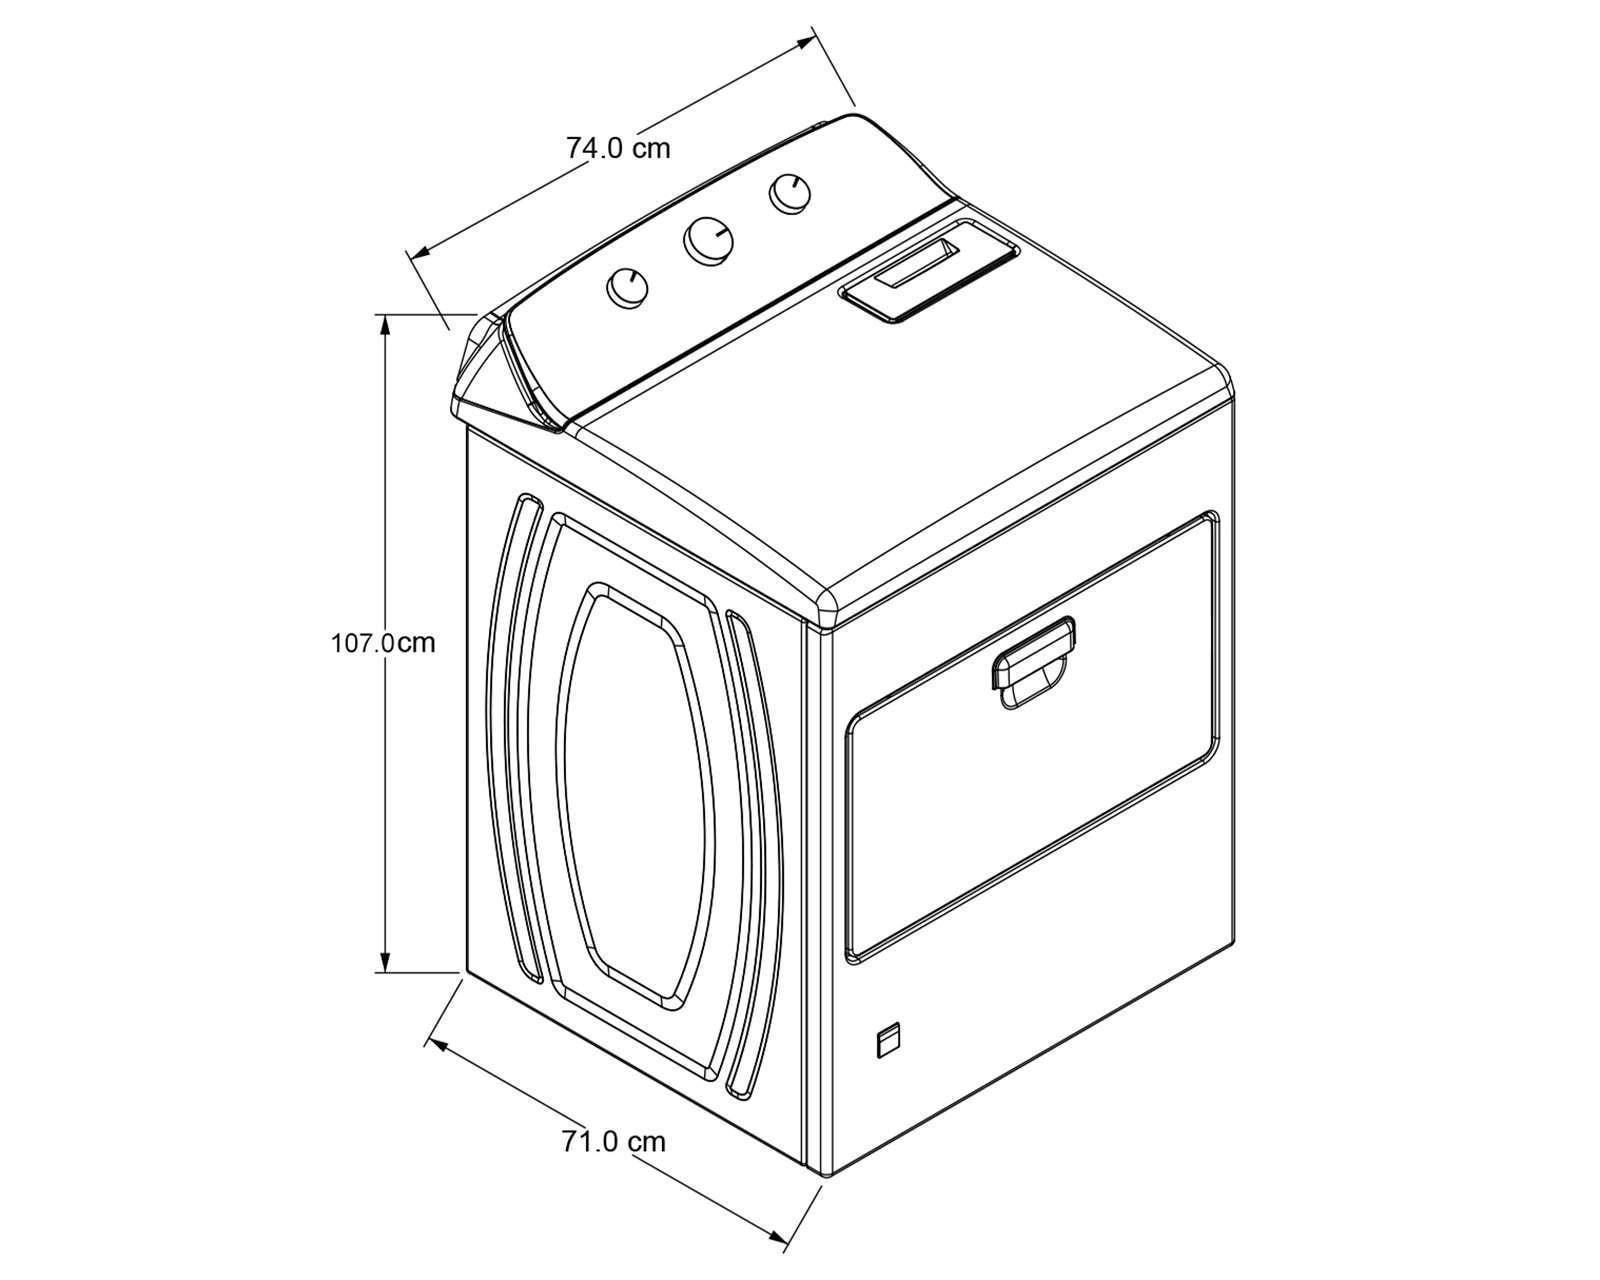 Foto 6 Secadora Whirlpool Automática 7MWGD1930JM 20 kg Blanca